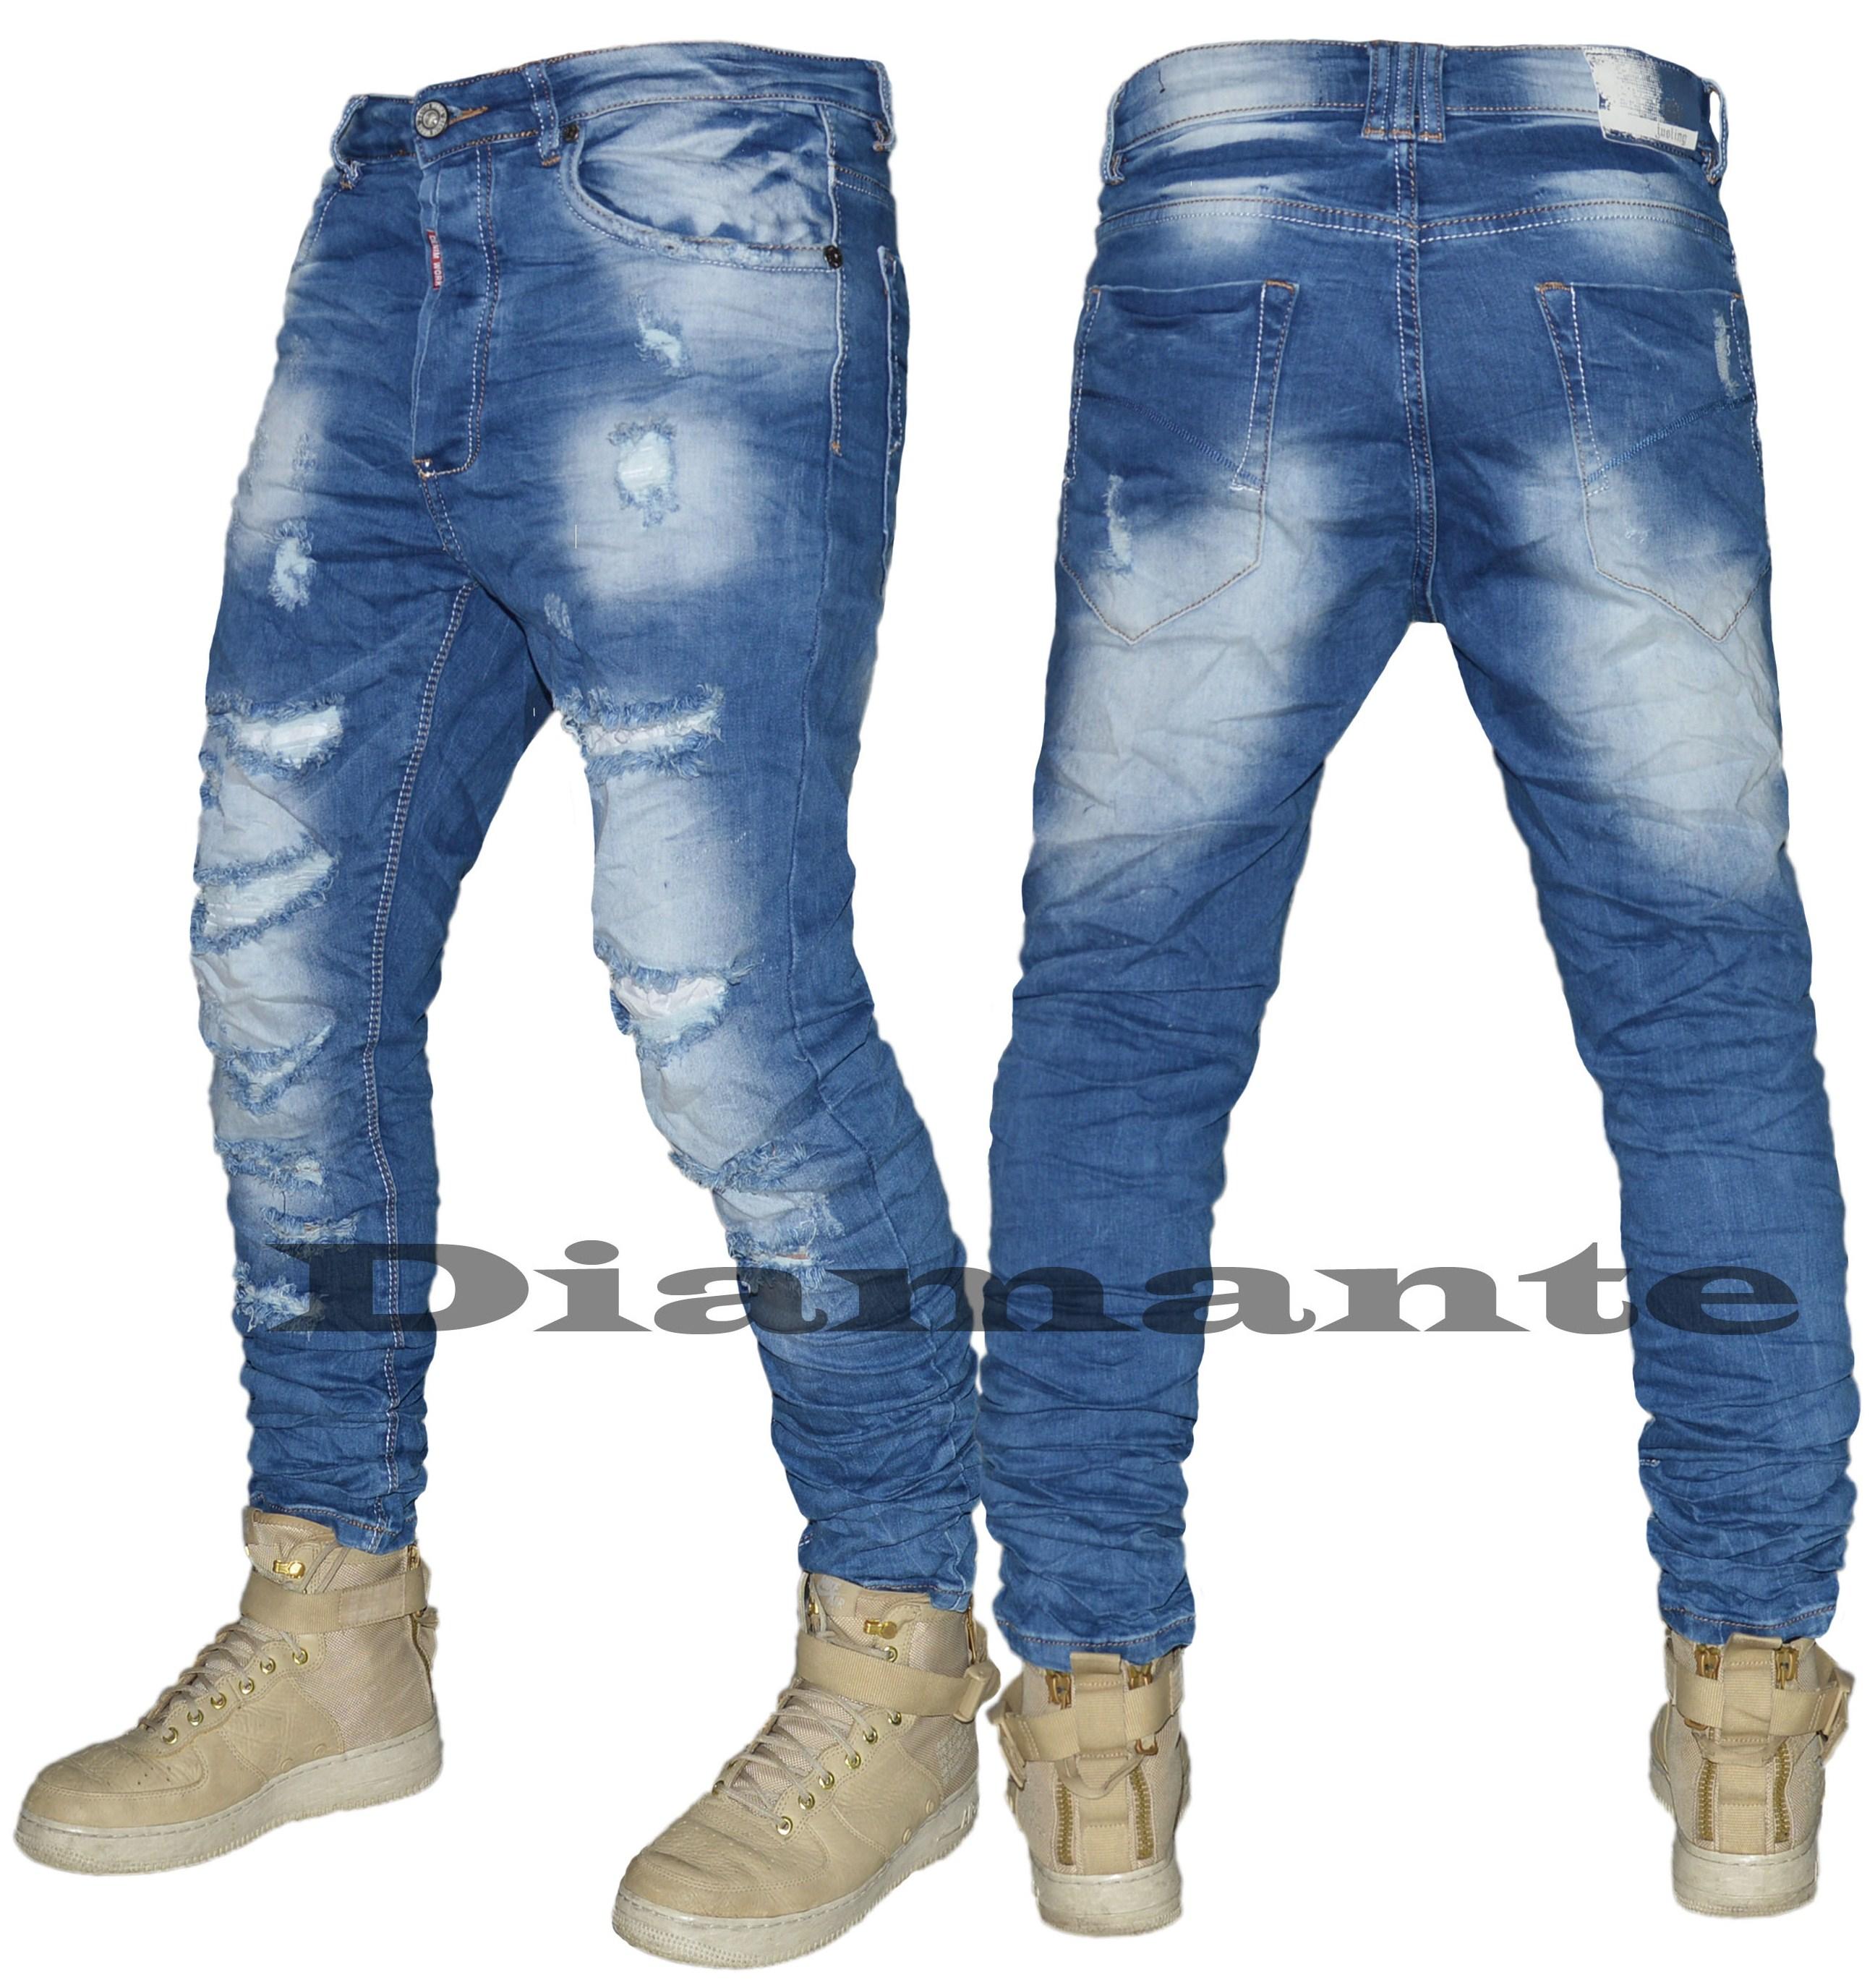 Jeans Uomo Denim slim elasticizzato Pantalone Blu Effe Denim art 215